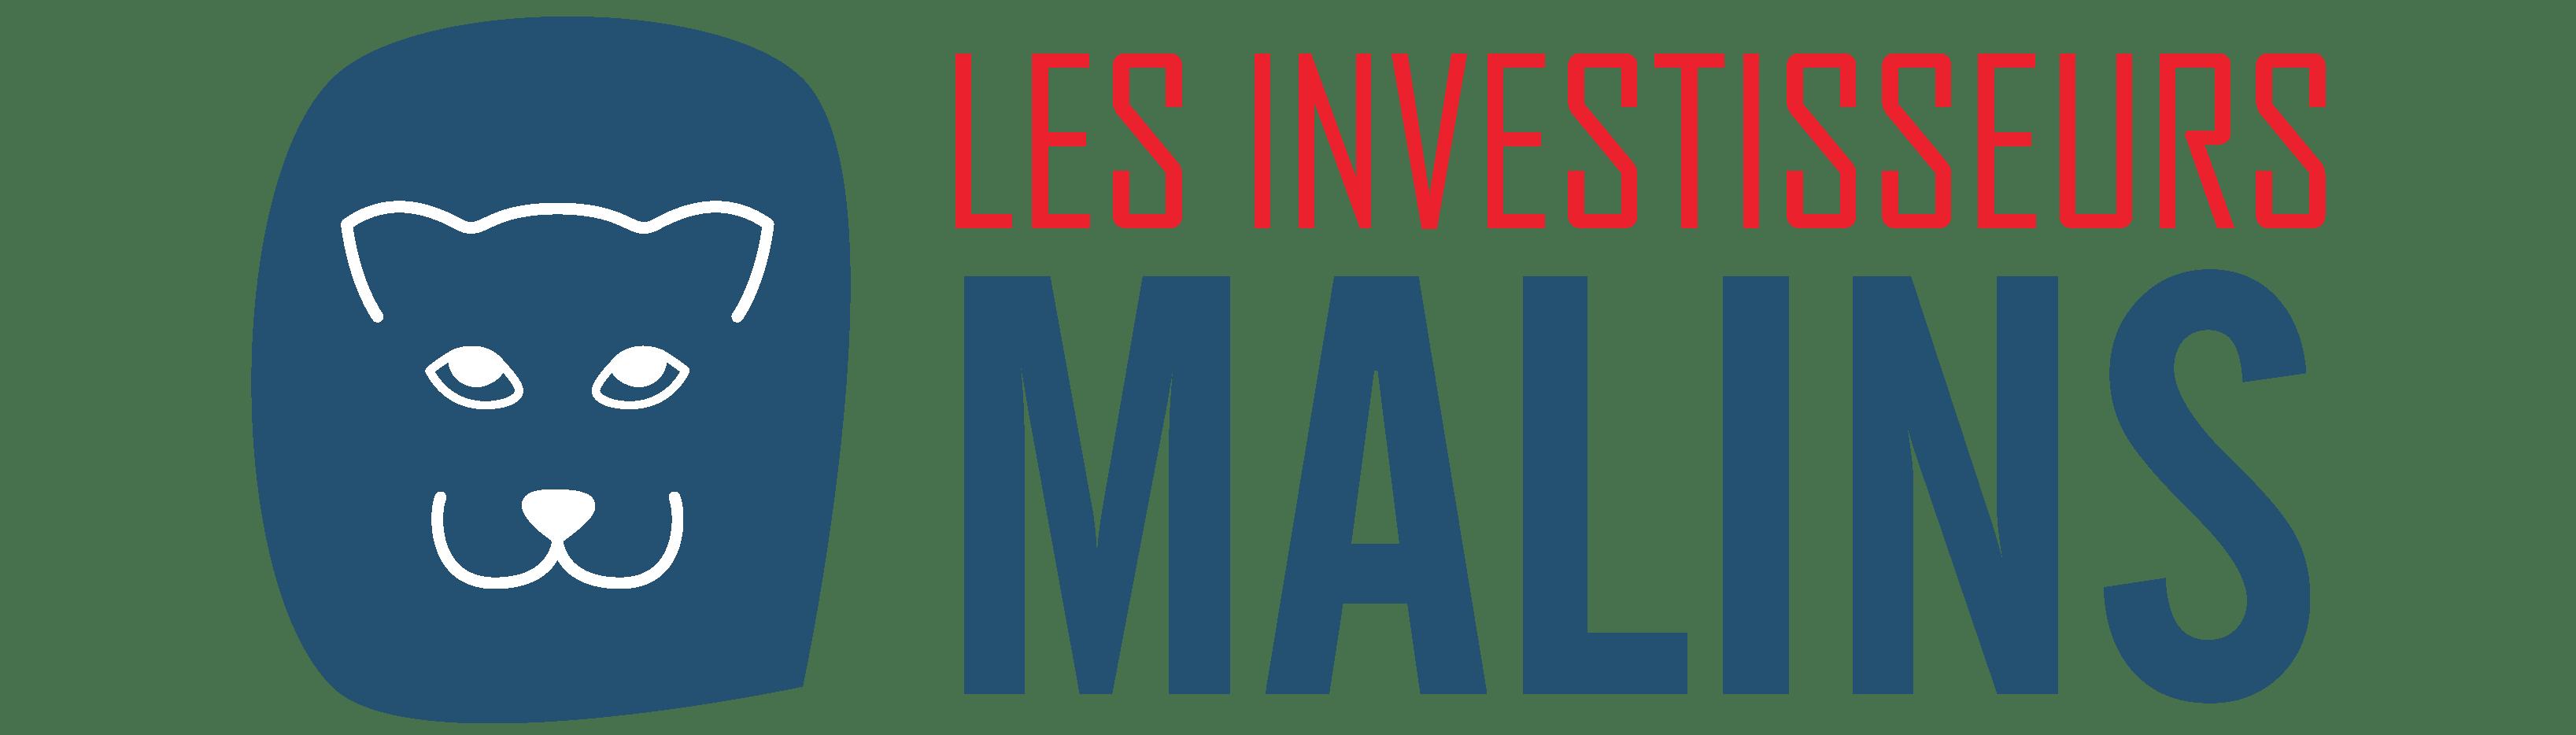 Les Investisseurs Malins